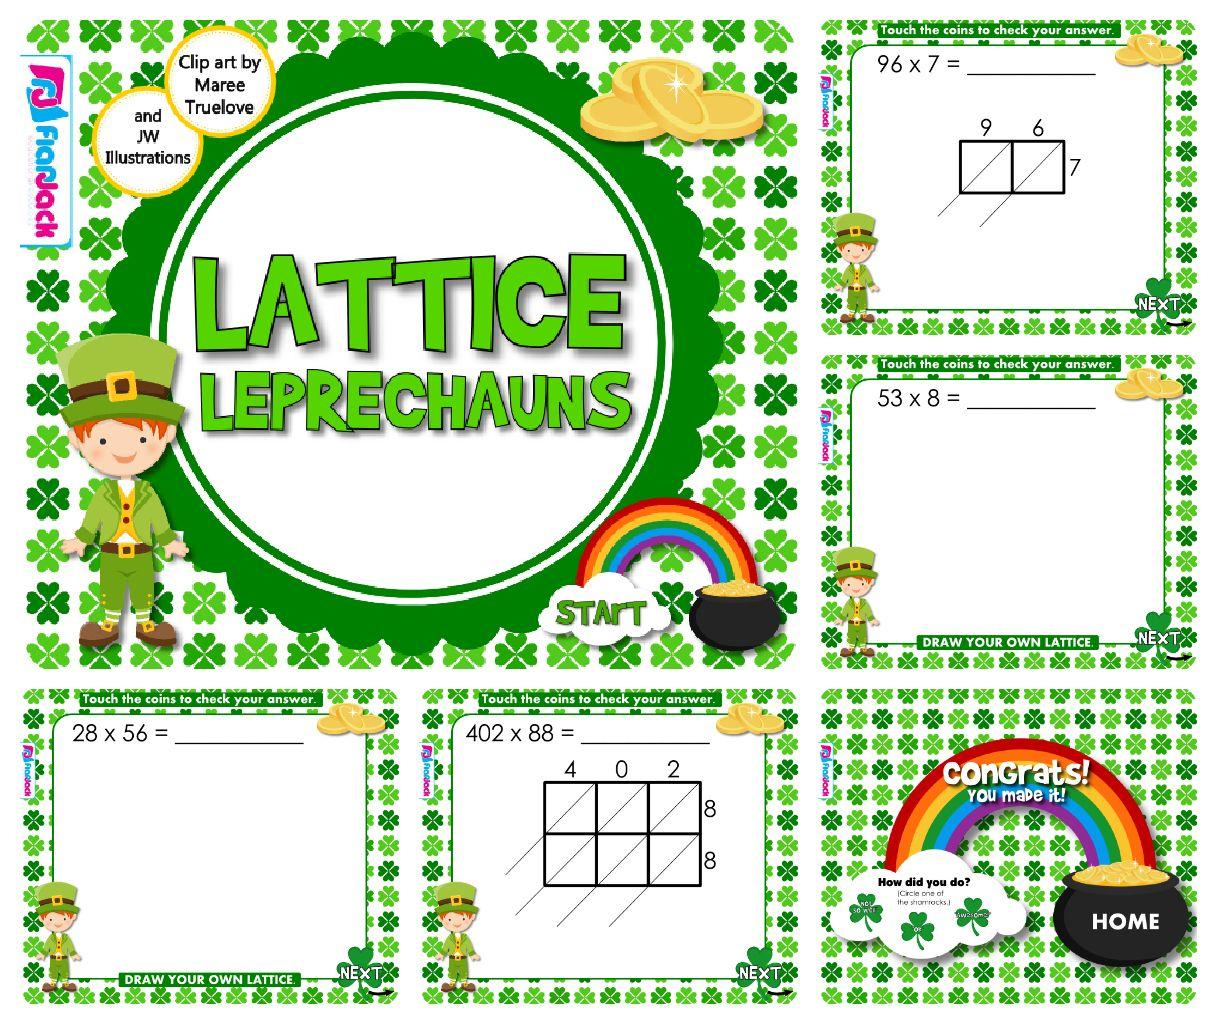 Lattice Leprechauns Multiplication Smart Board